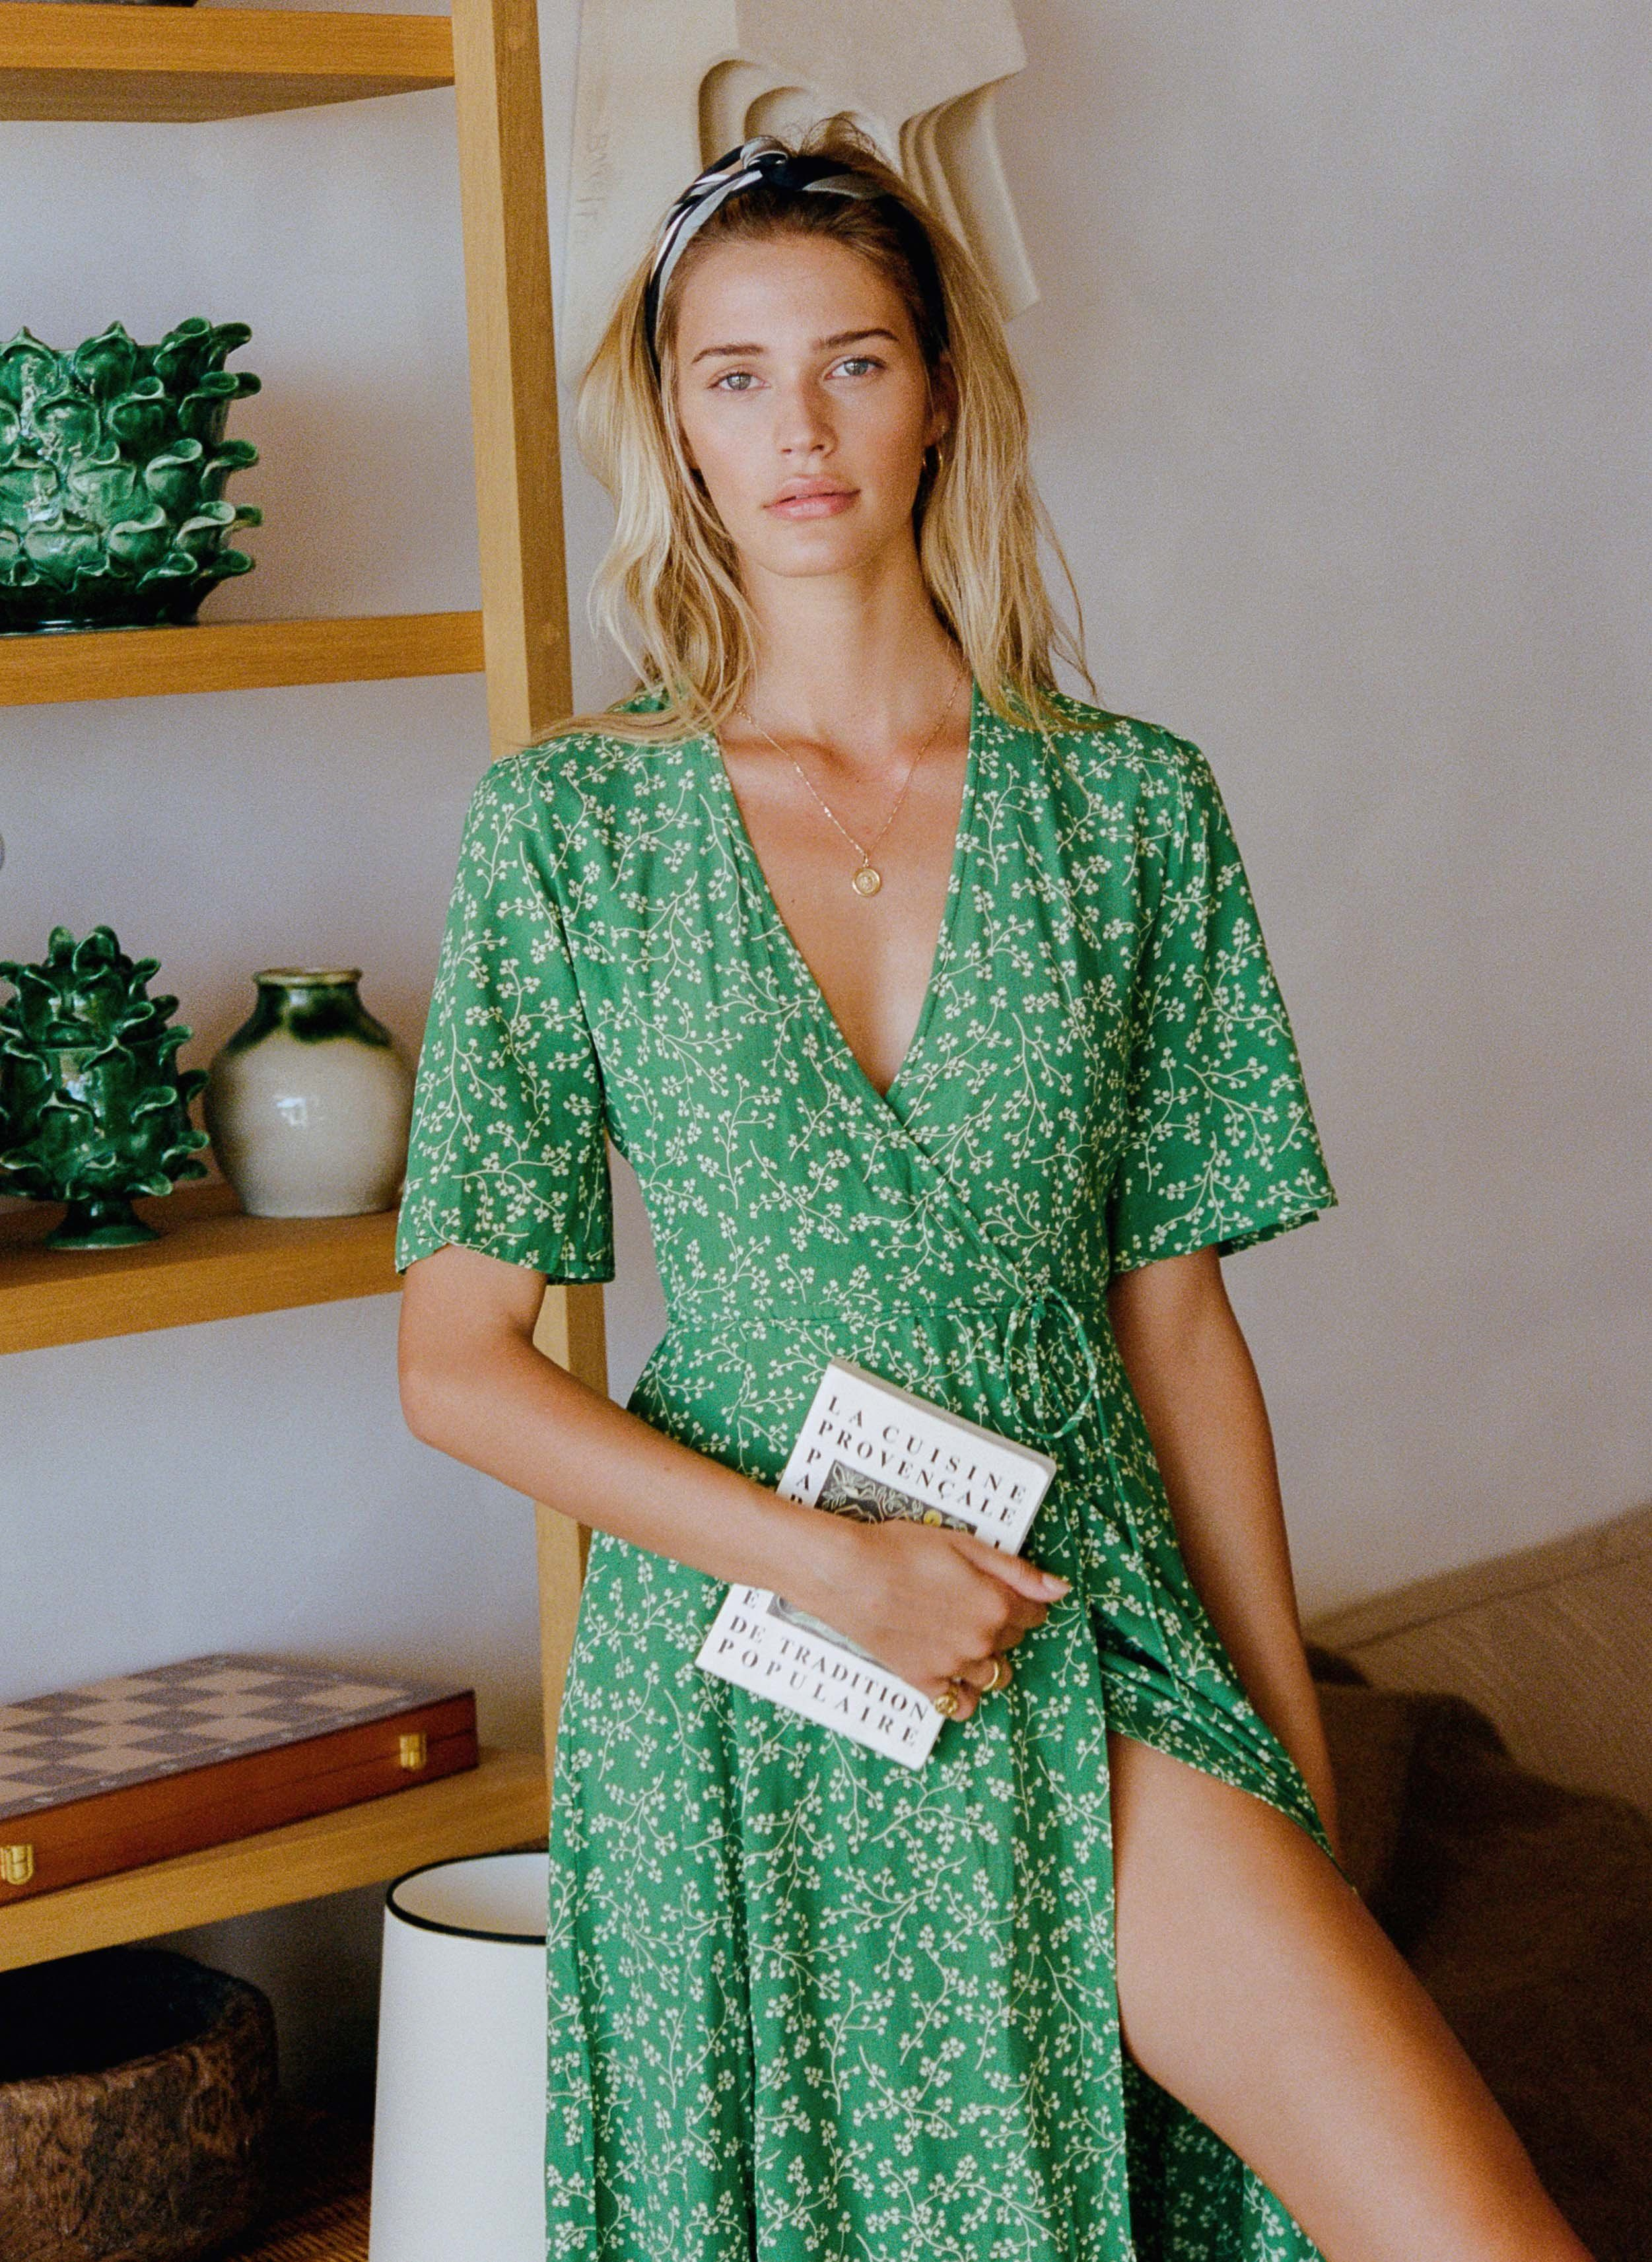 5522eea2426f VIOLETTE PRINT - GREEN - RIVERA MIDI DRESS | Fashion in 2019 | Scarf ...